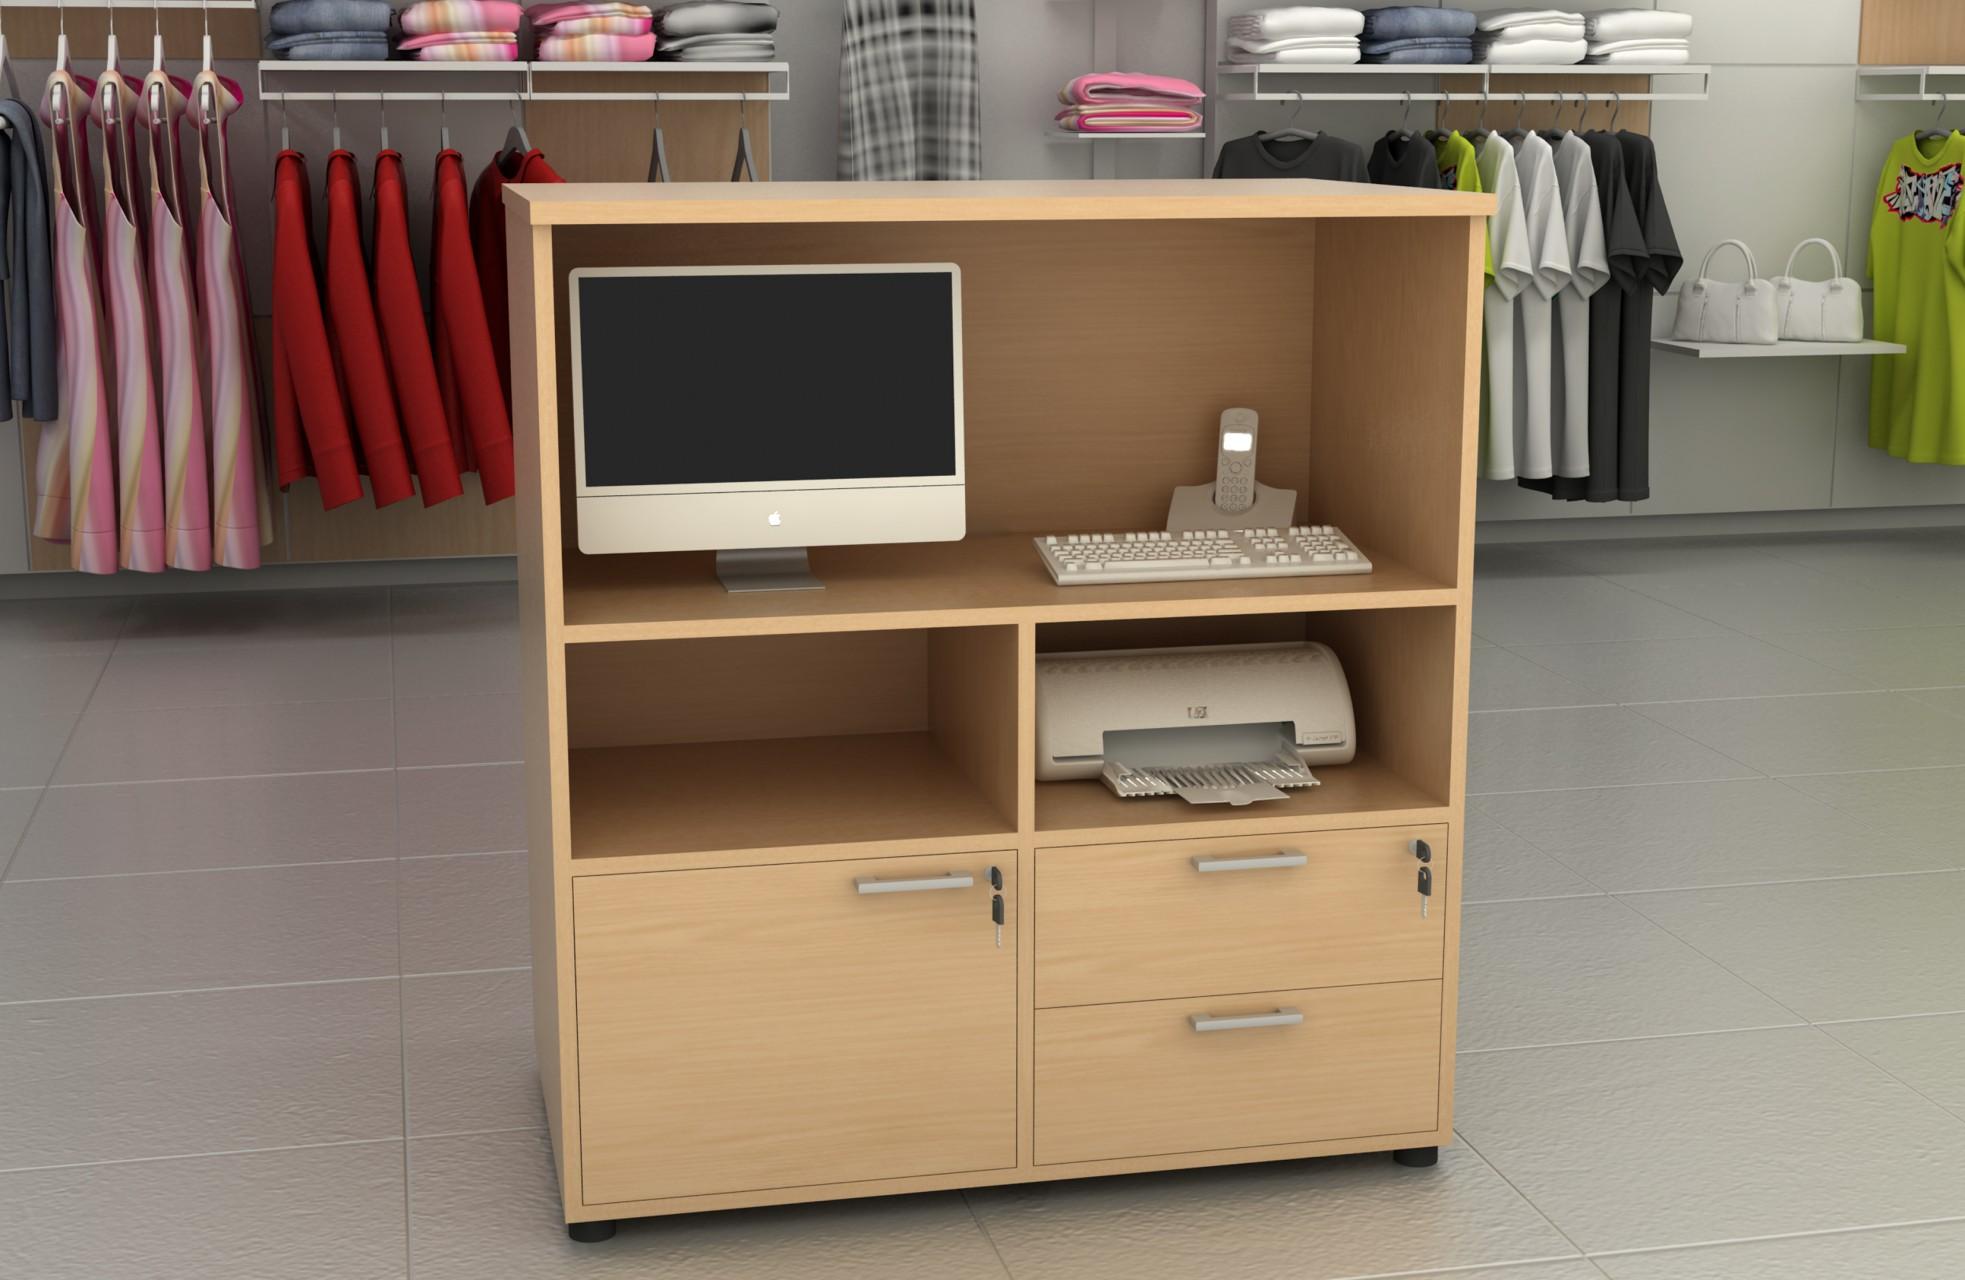 Comptoir magasin achat mobilier accueil entreprise 315 00 for Achat mobilier